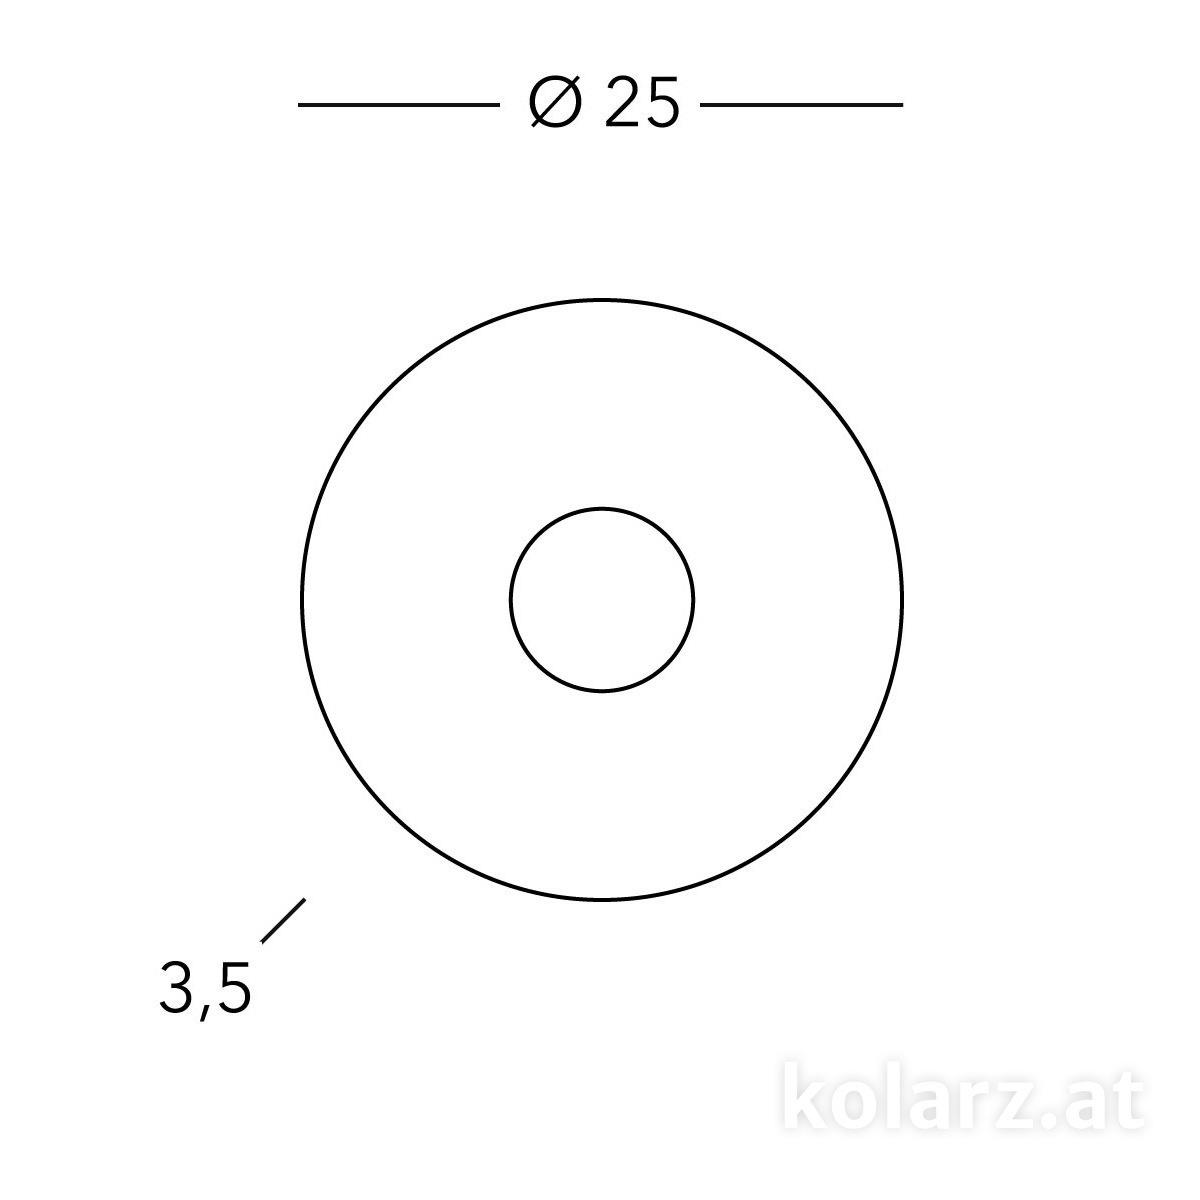 A1336-11-1-Cu-s1.jpg